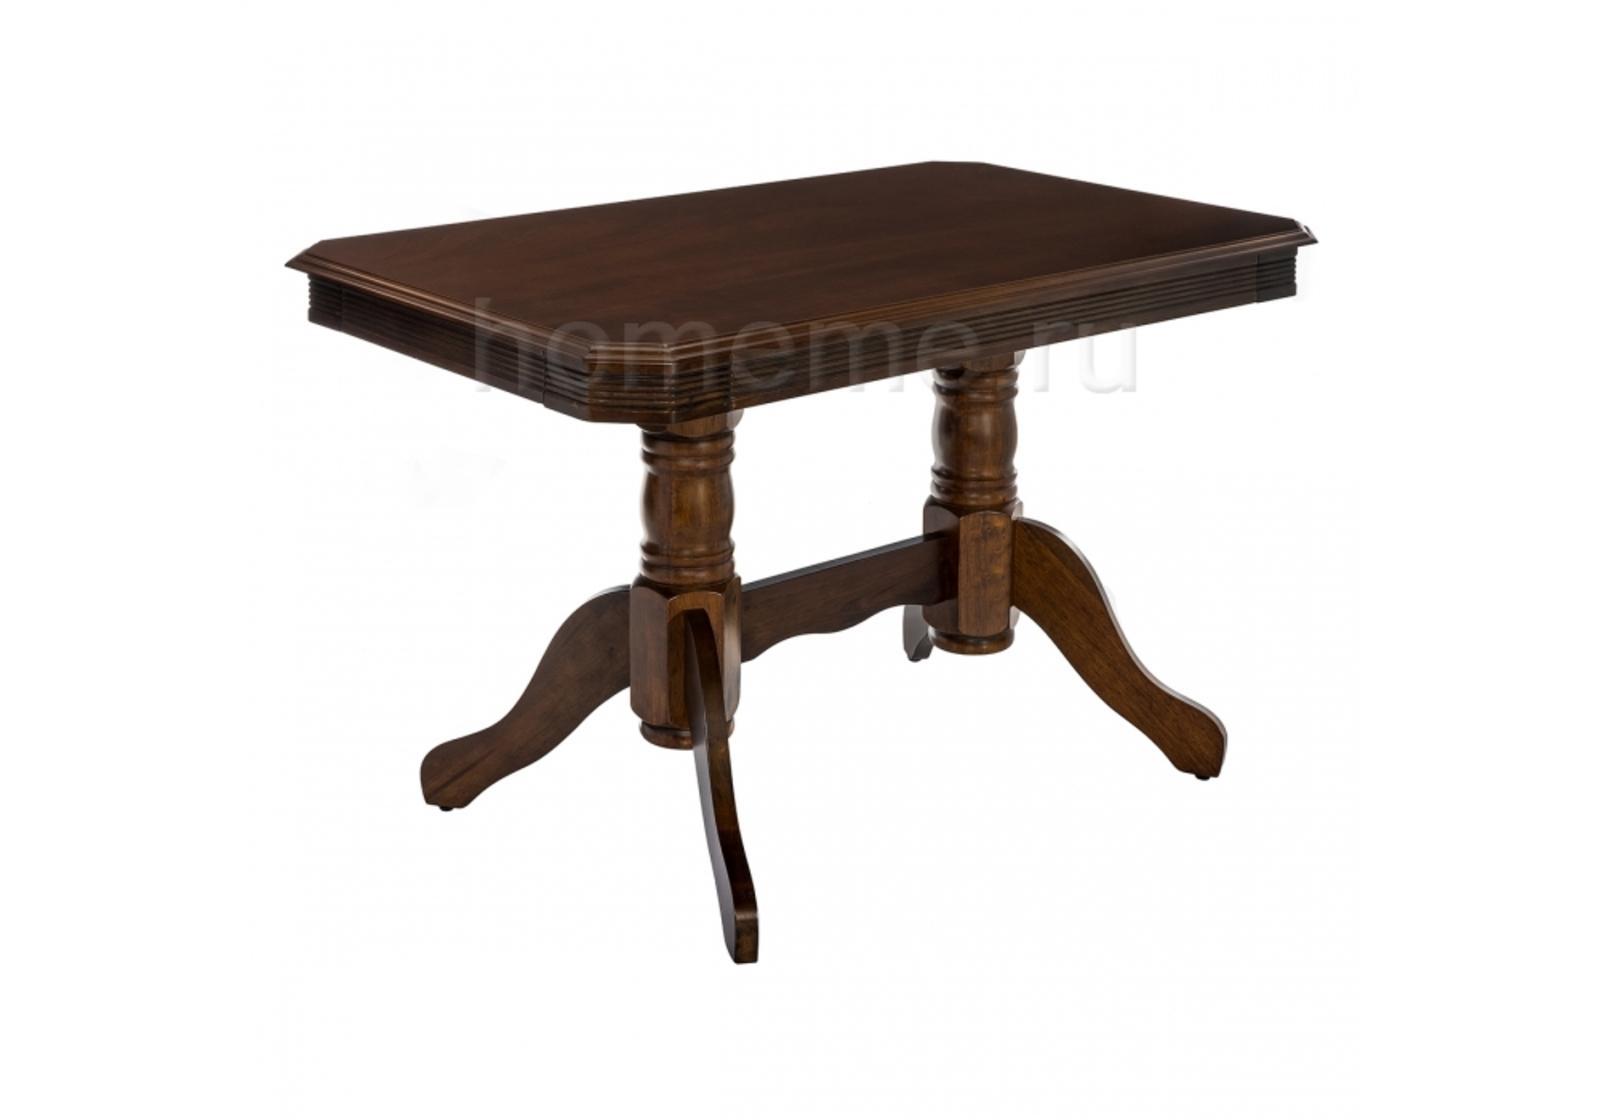 Стол деревянный Verona dirty oak 11415 Verona dirty oak 11415 (17263)